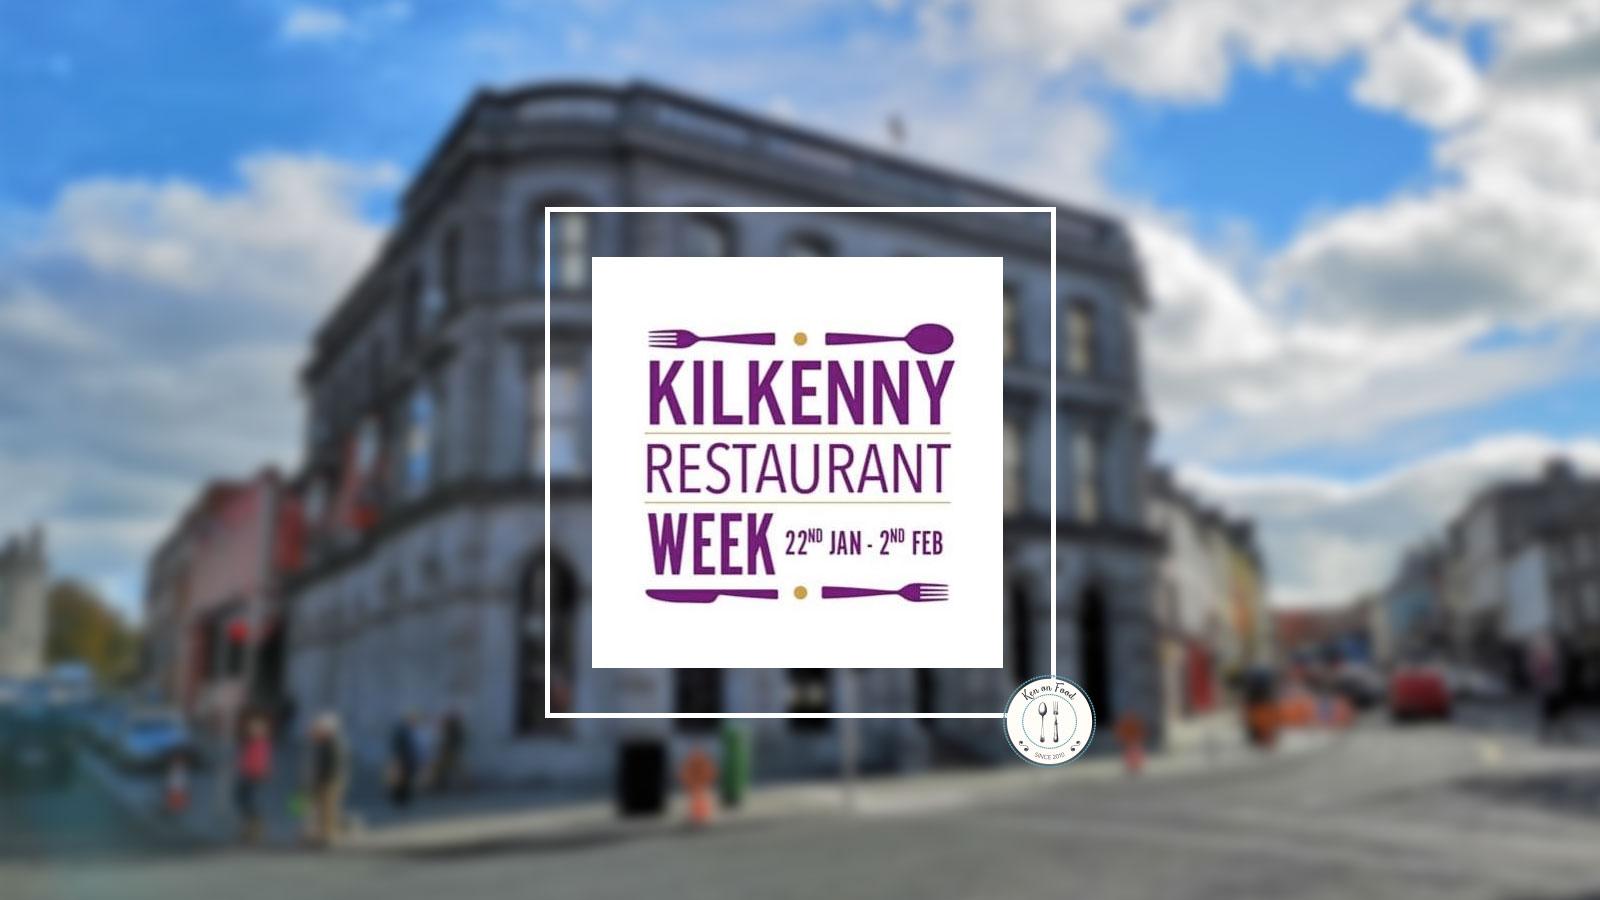 Casual encounters Kilkenny | Locanto Dating in Kilkenny